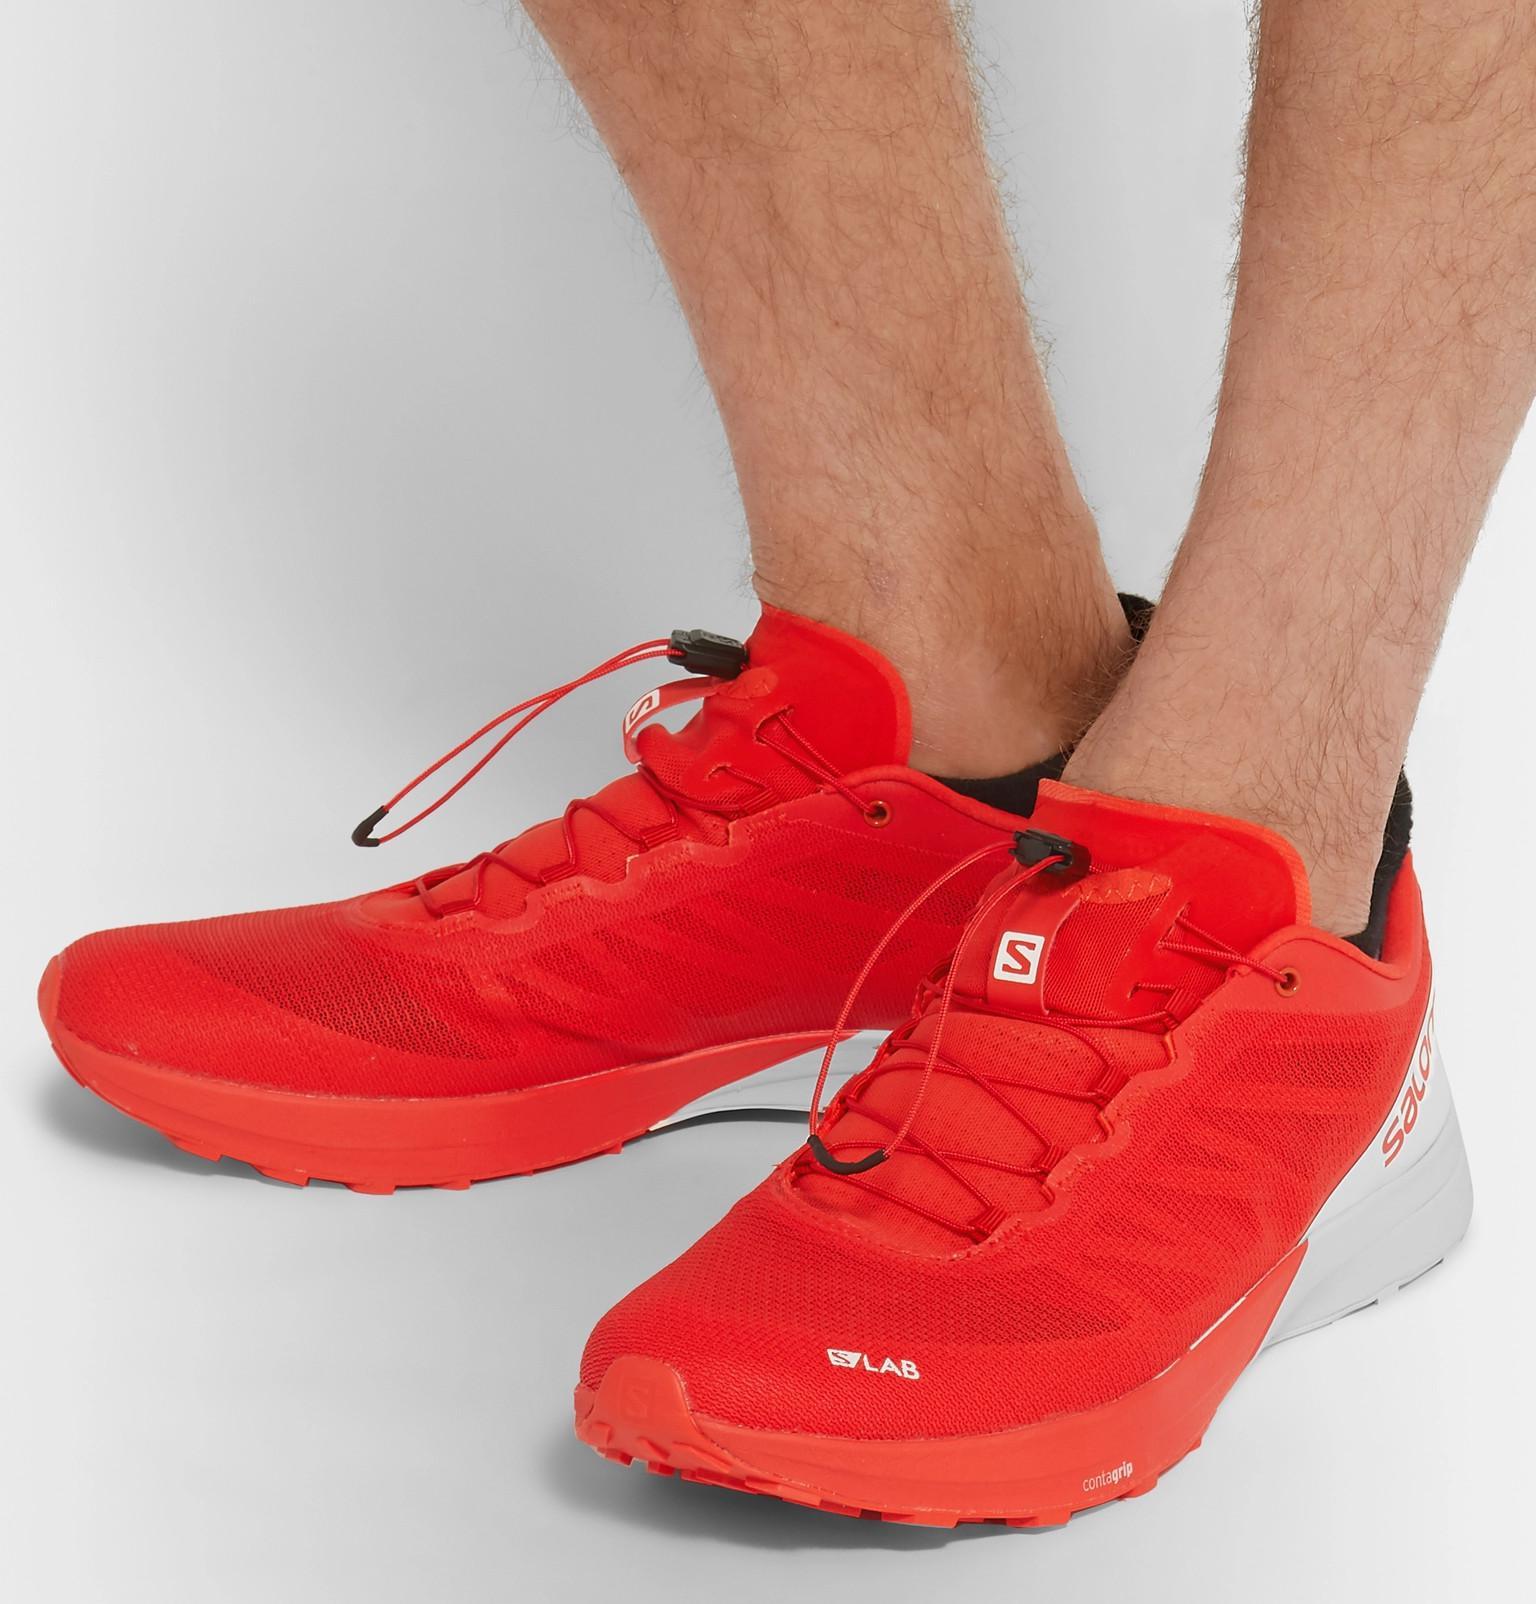 buy online 1bbbd 2e314 Yves Salomon S/lab Sense 7 Two-tone Mesh Running Sneakers in ...